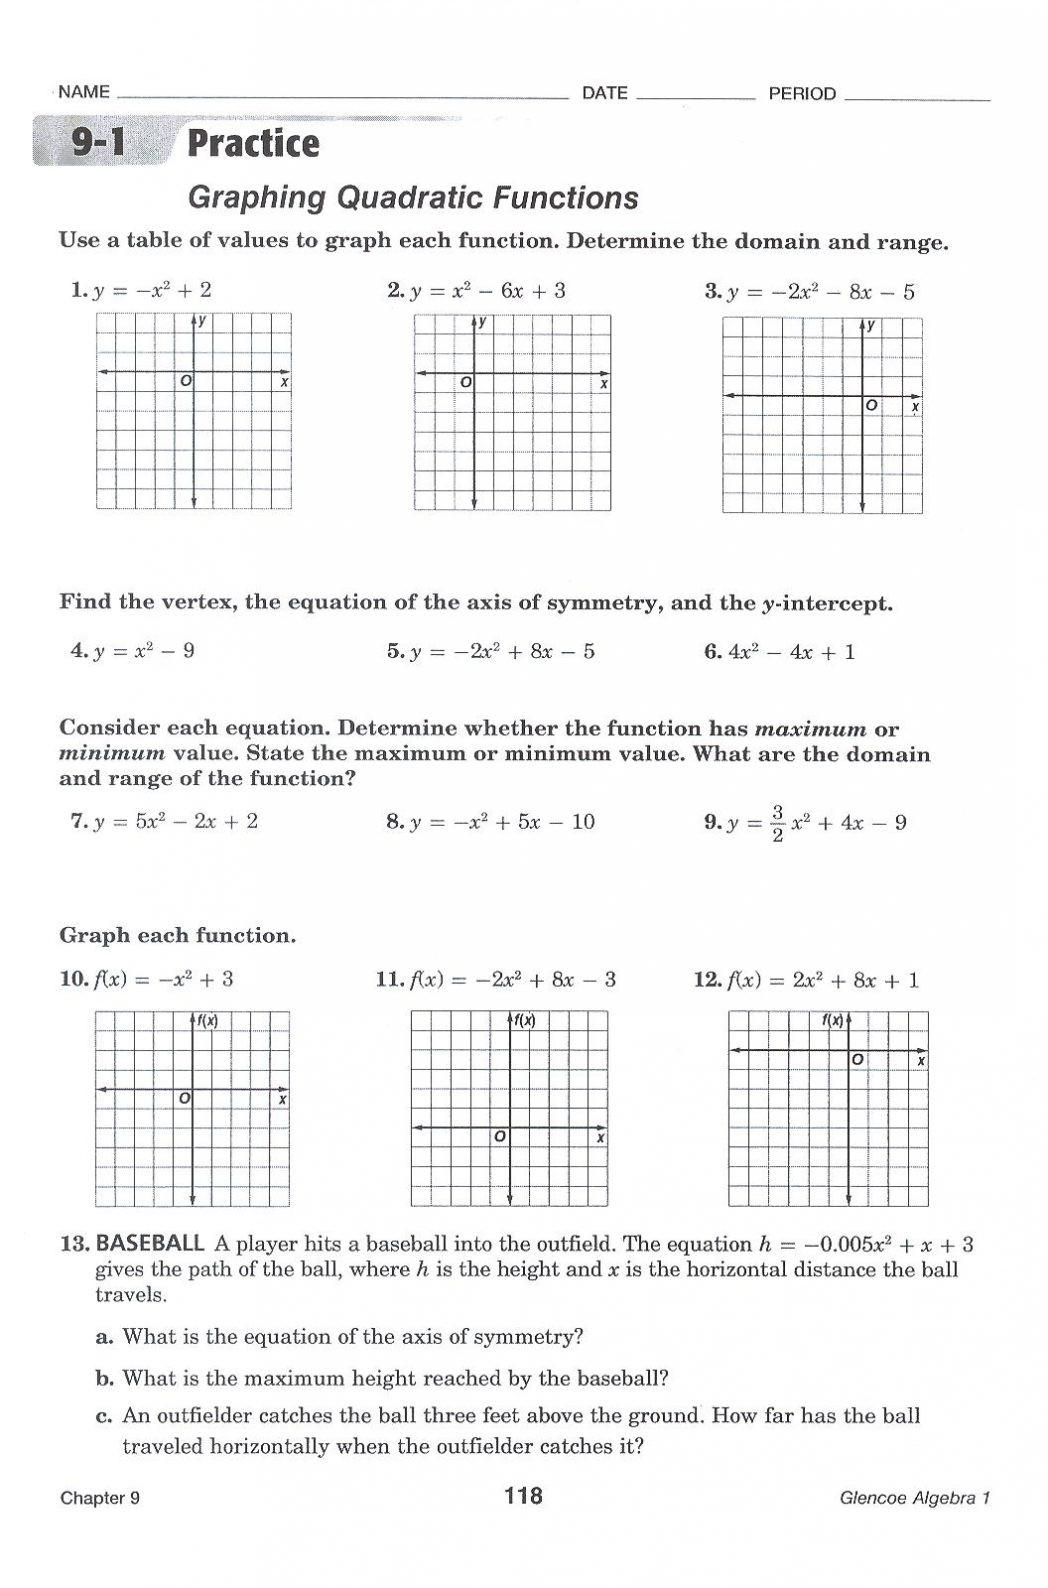 Quadratic Functions Worksheet Answers Free Graphing Quadratic Functions Worksheet